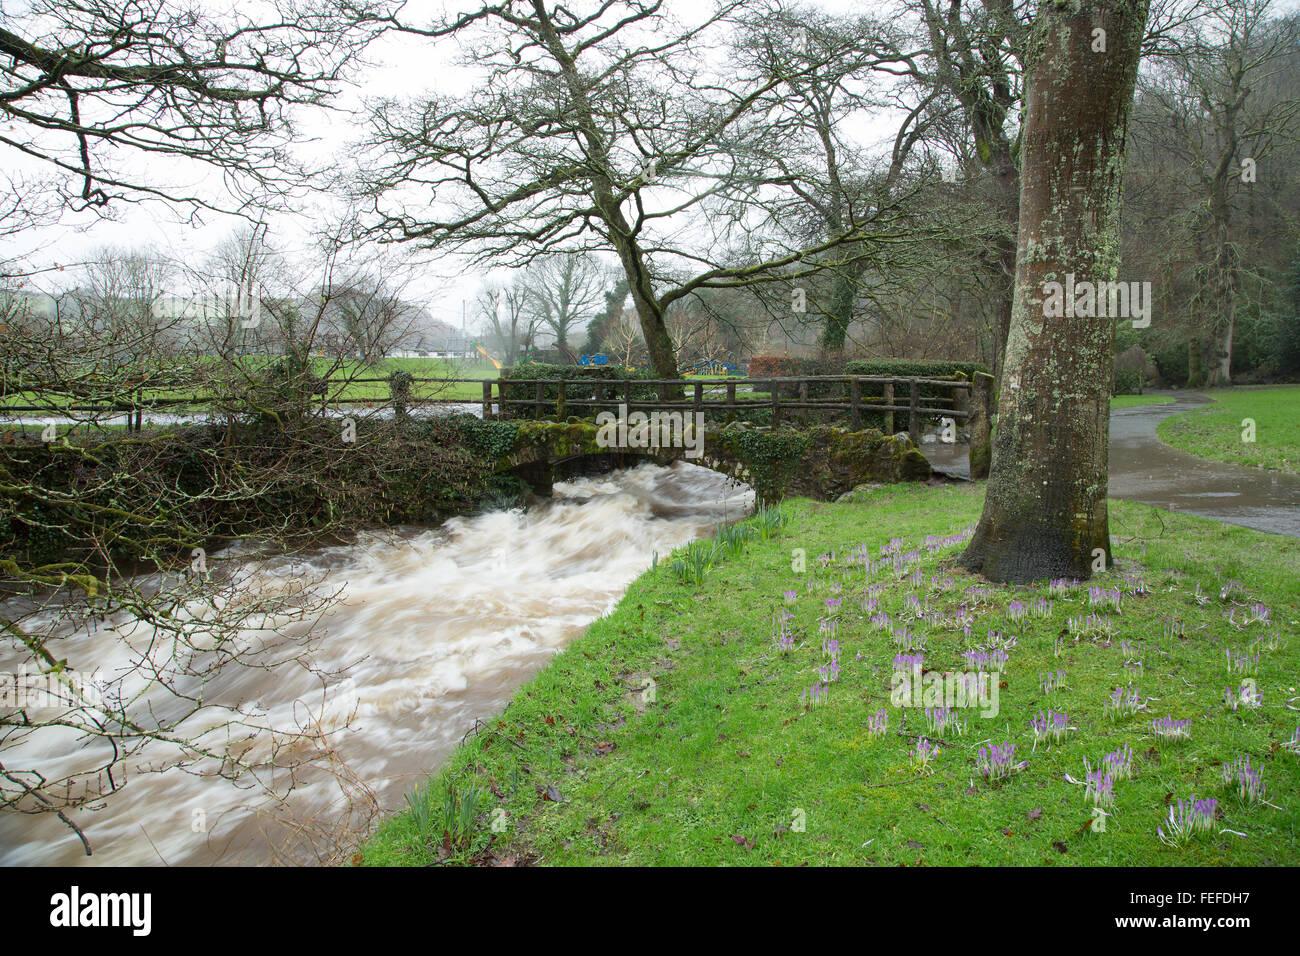 Okehampton, Devon, UK. 6th February, 2016. High river levels at Simmons Park in Okehampton during storm. Credit: Stock Photo